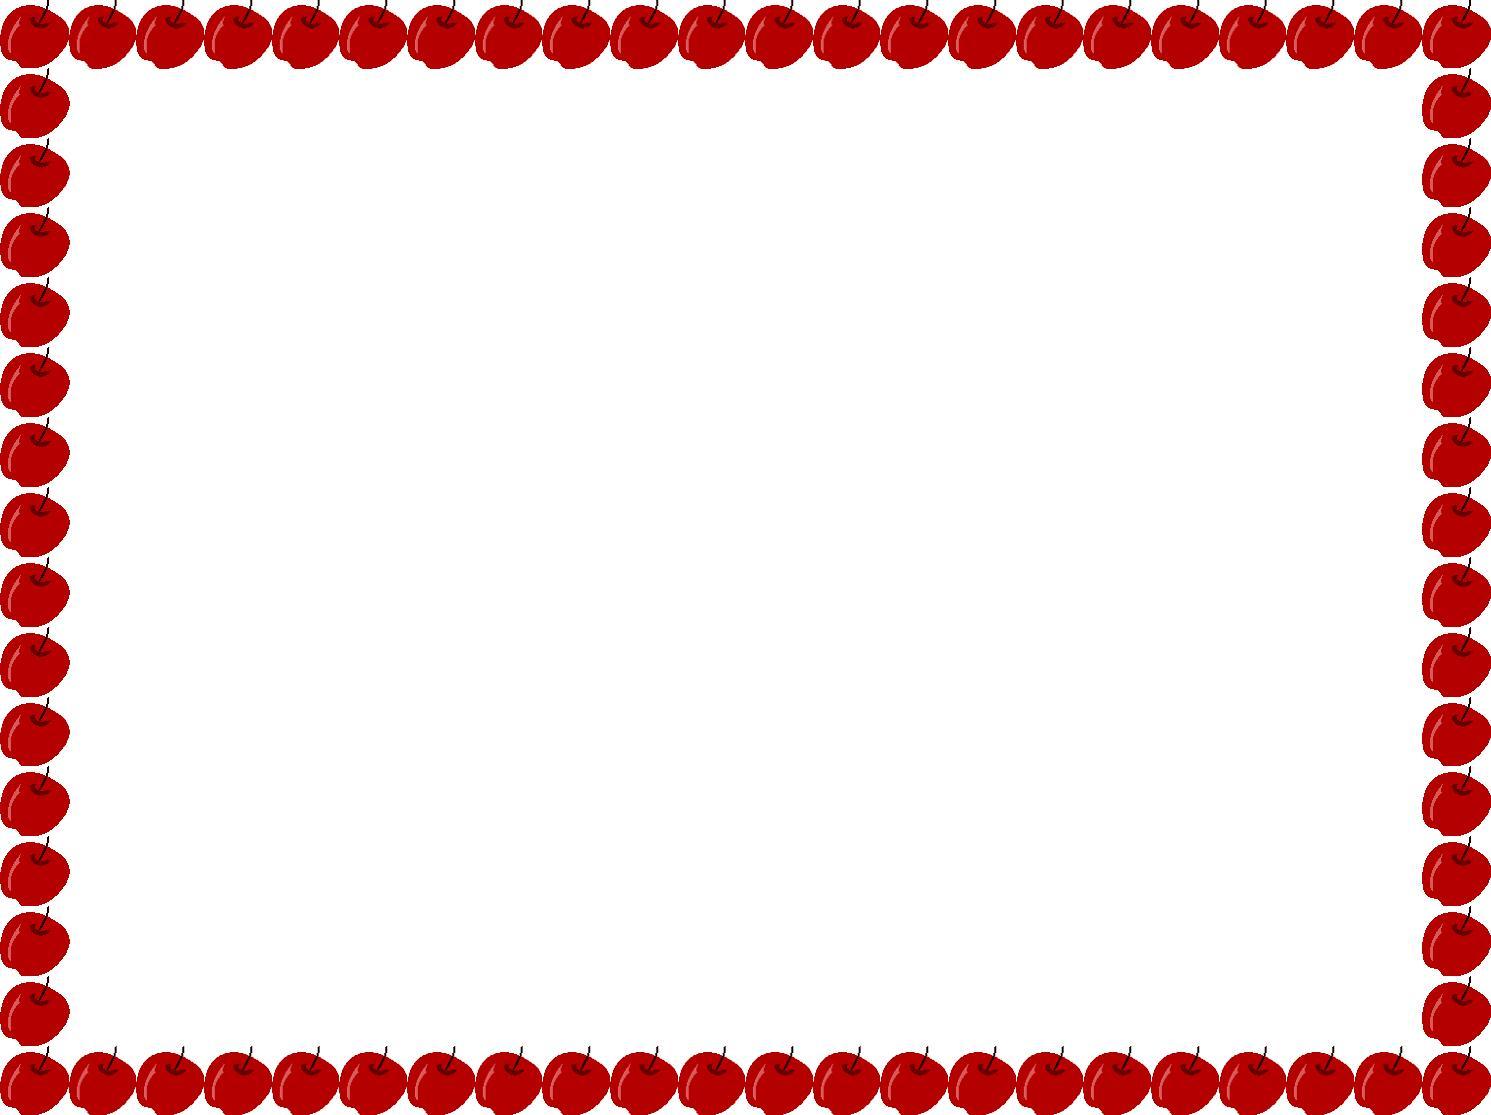 1491x1115 Clipart Borders Chevron Full Page Zig Zag Border